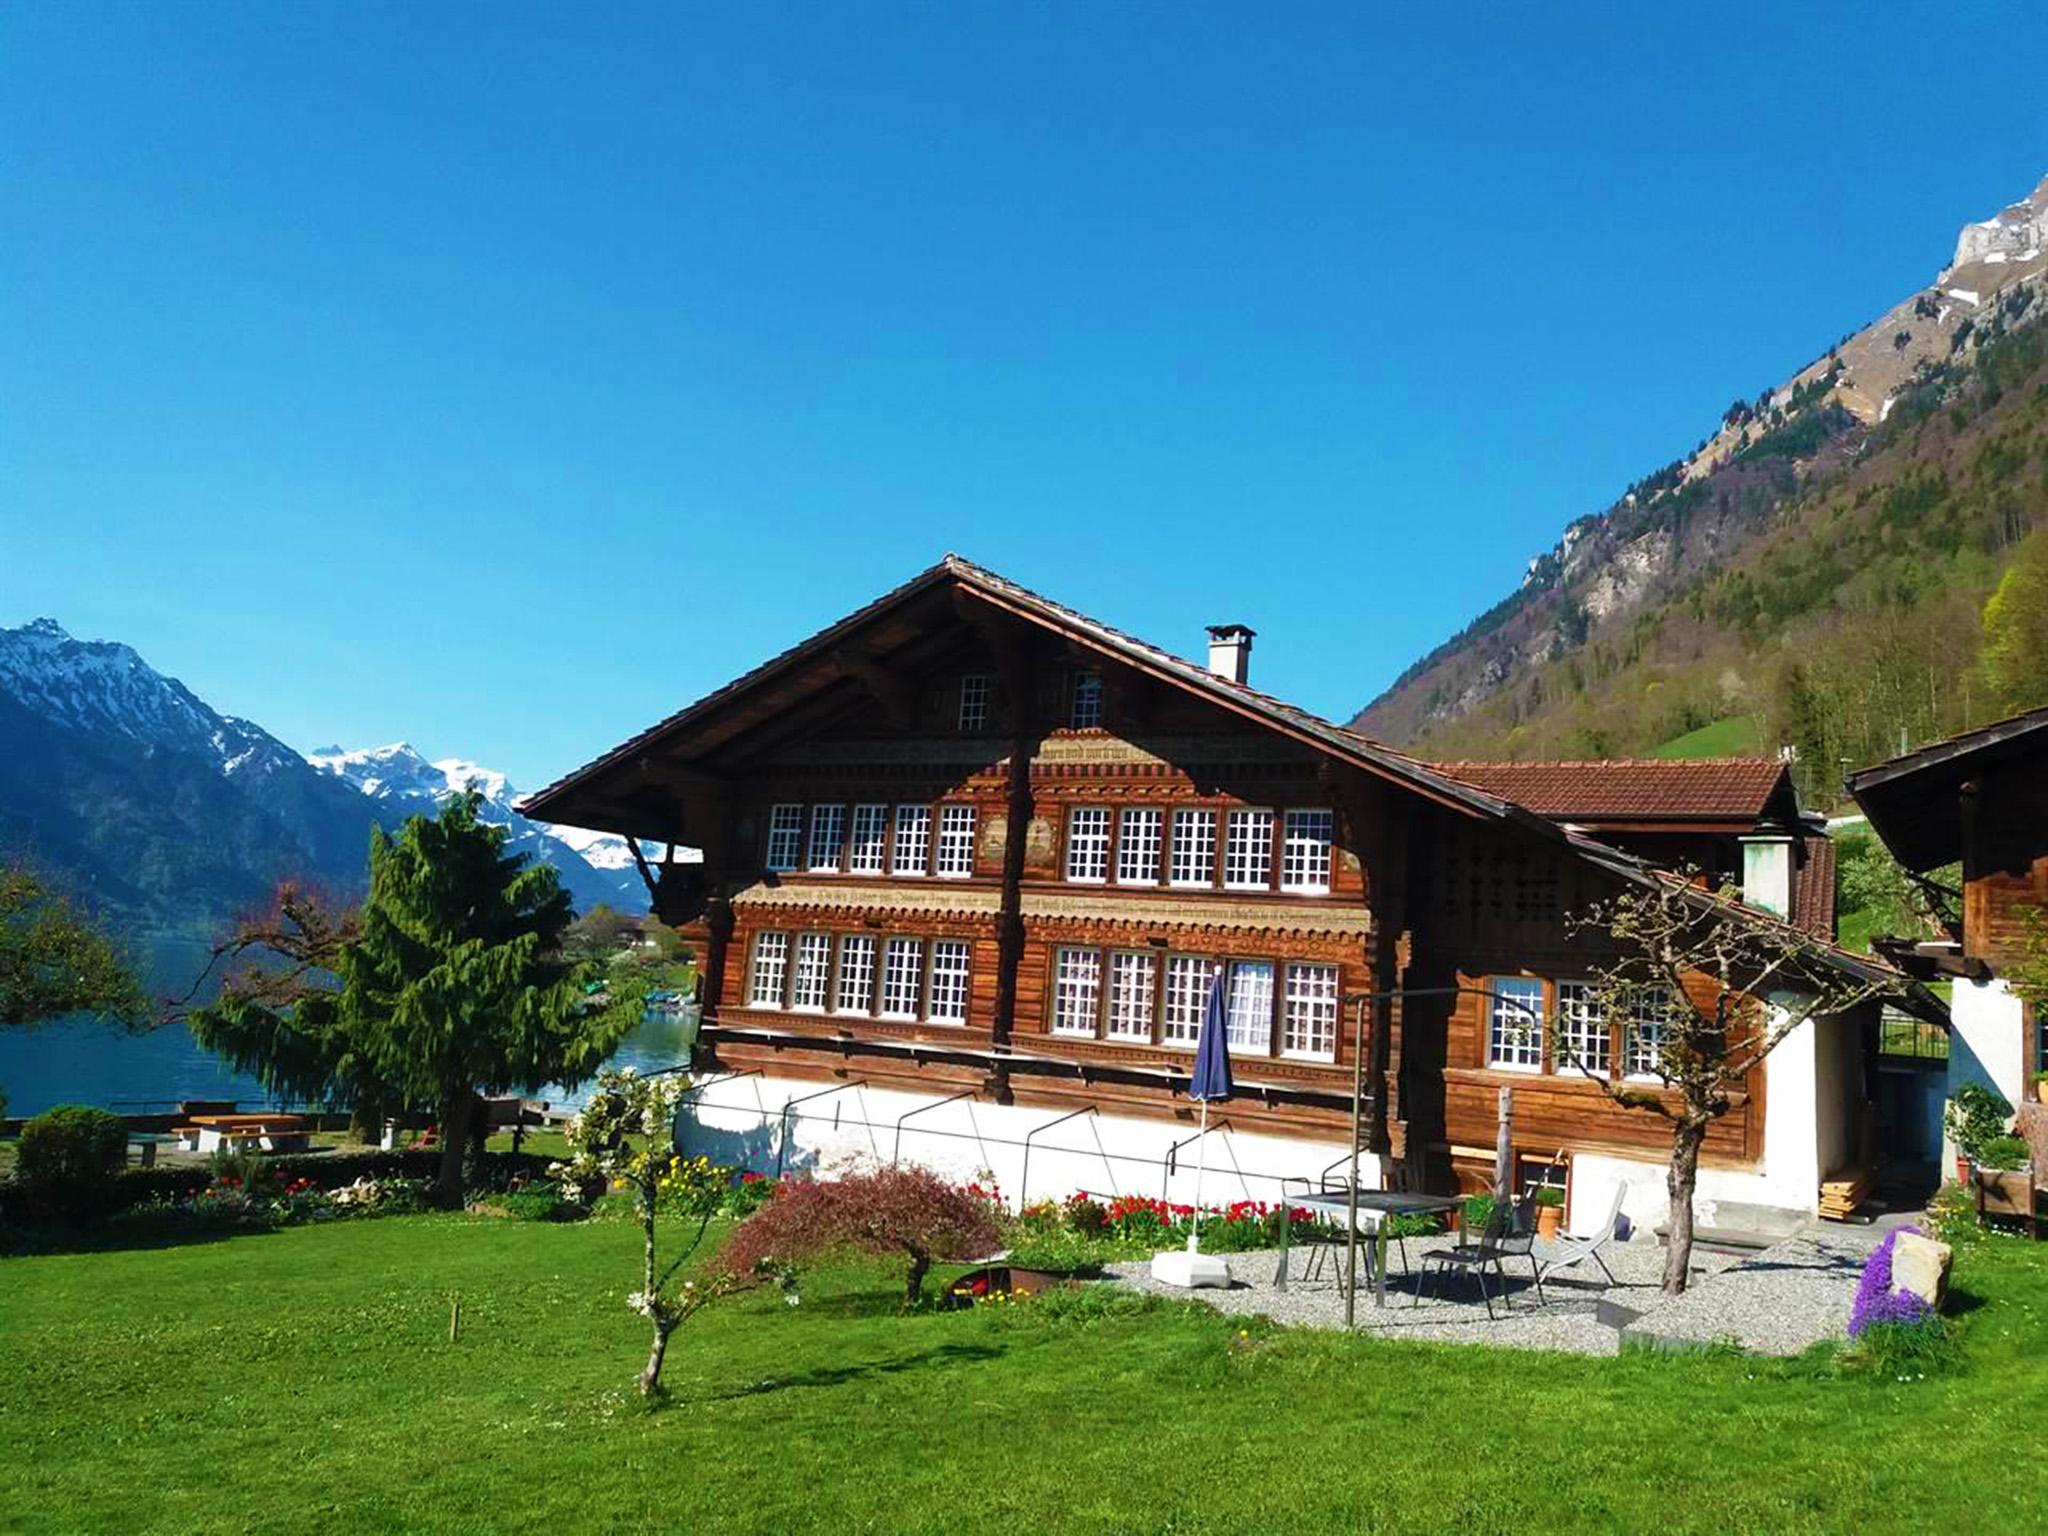 kt_2020_360_Keytours_excursions_Swisstours_interlaken_village6_2048_10